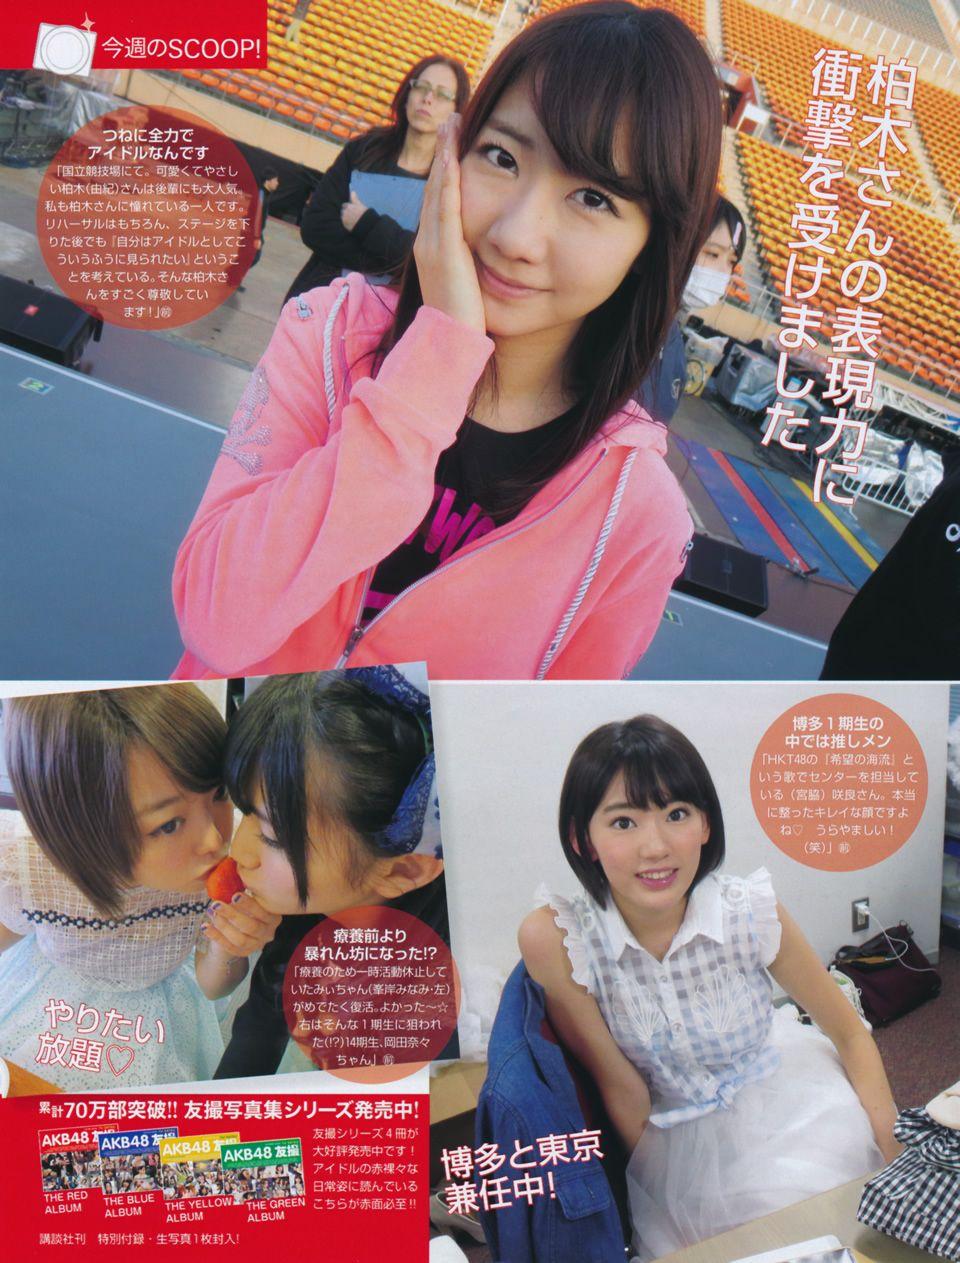 AKB複数画像スレ51: AKB48,SKE48,NMB48,HKT48画像掲示板♪